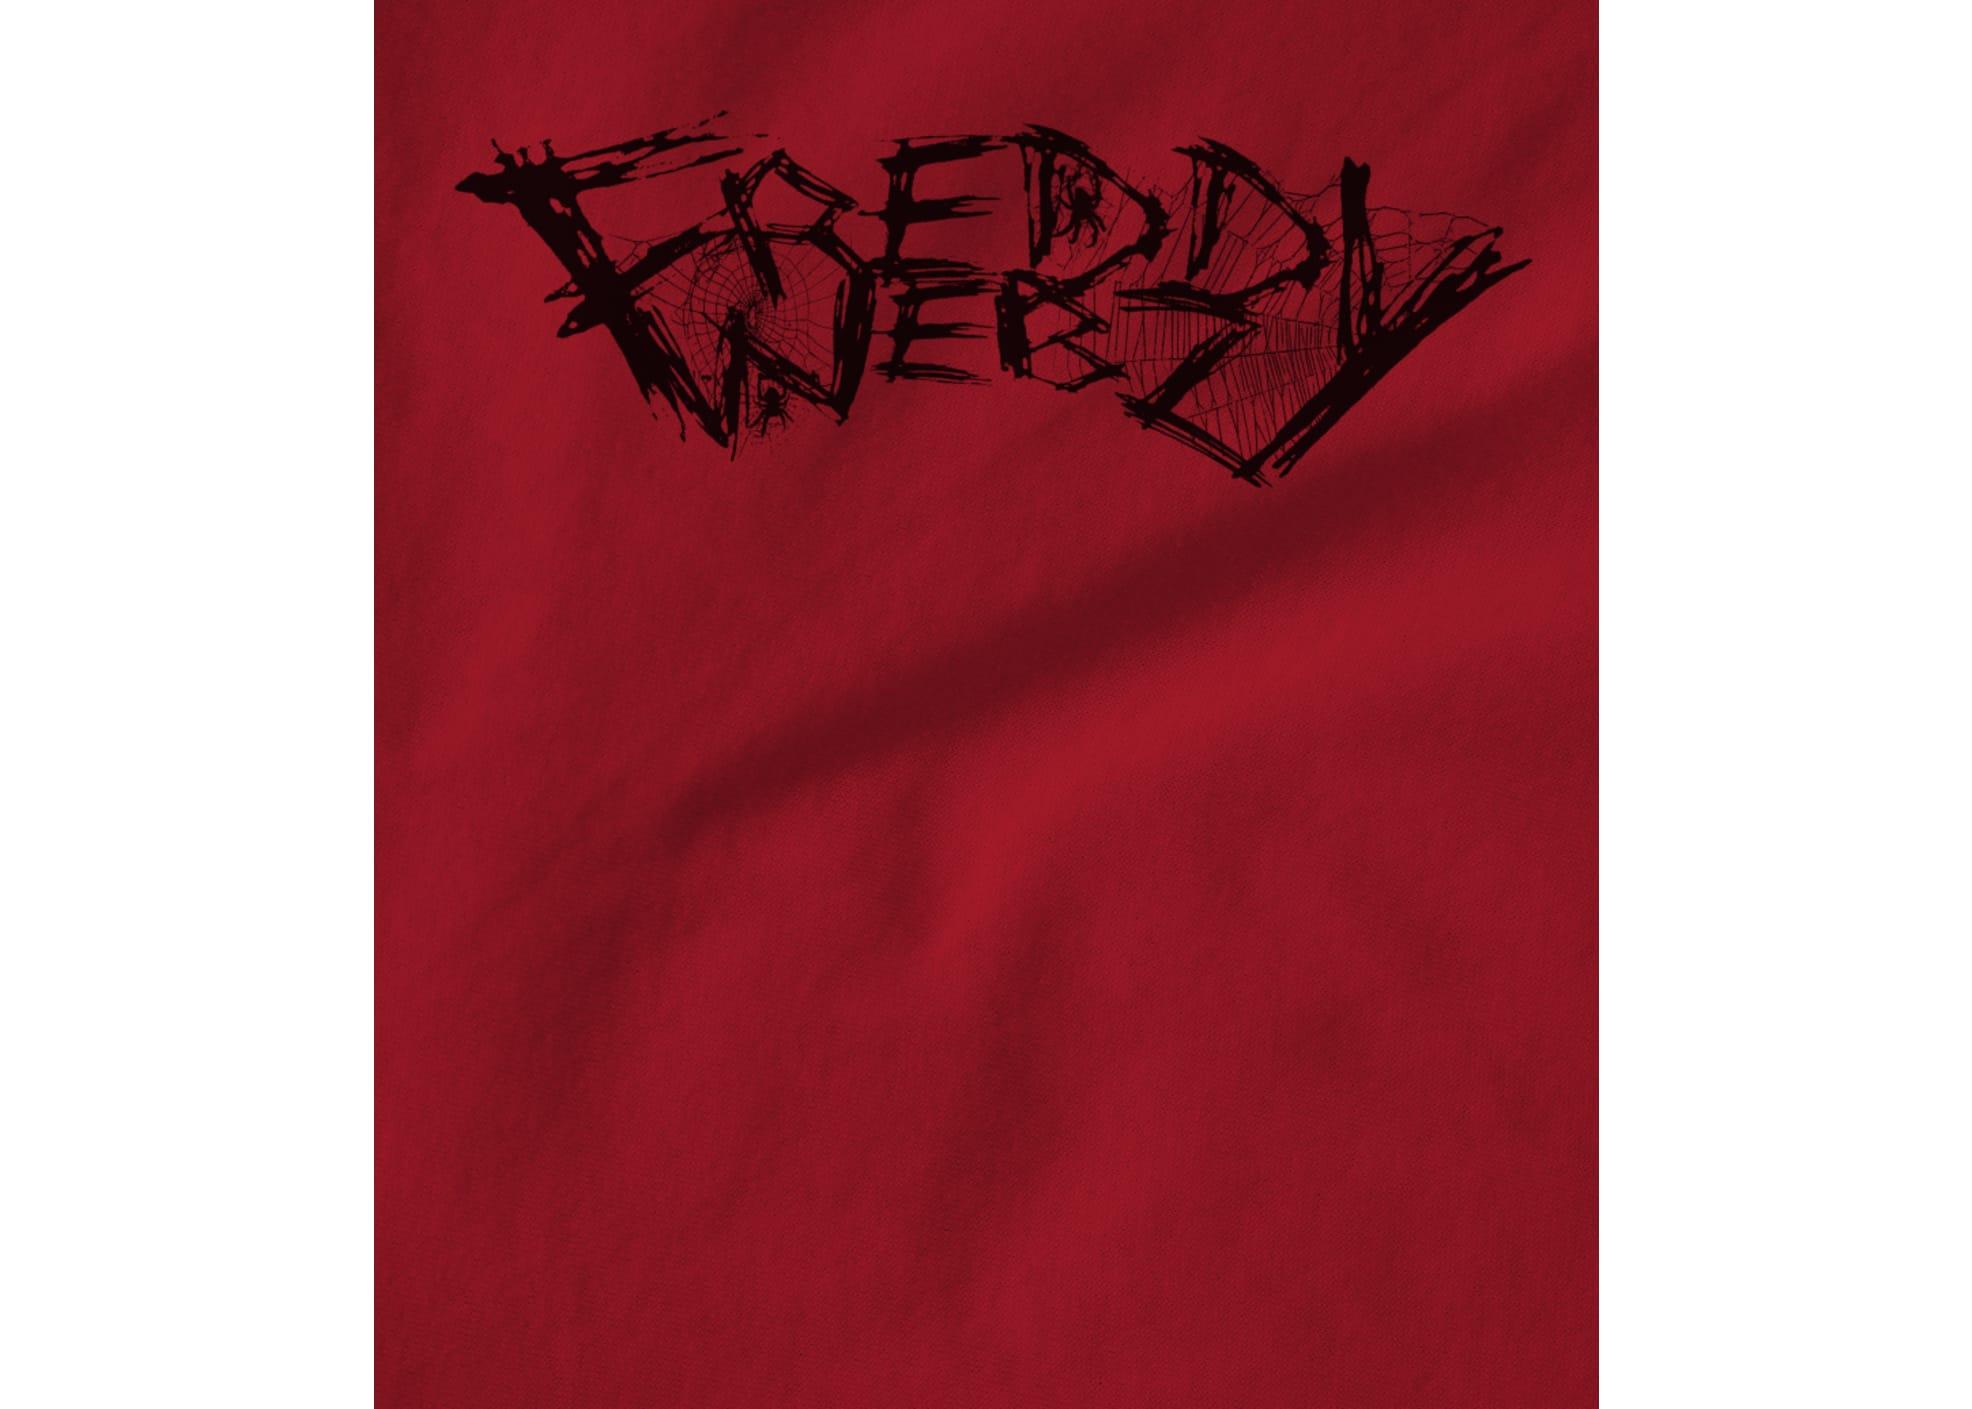 Freddy webz freddy webz logo red 1610693033